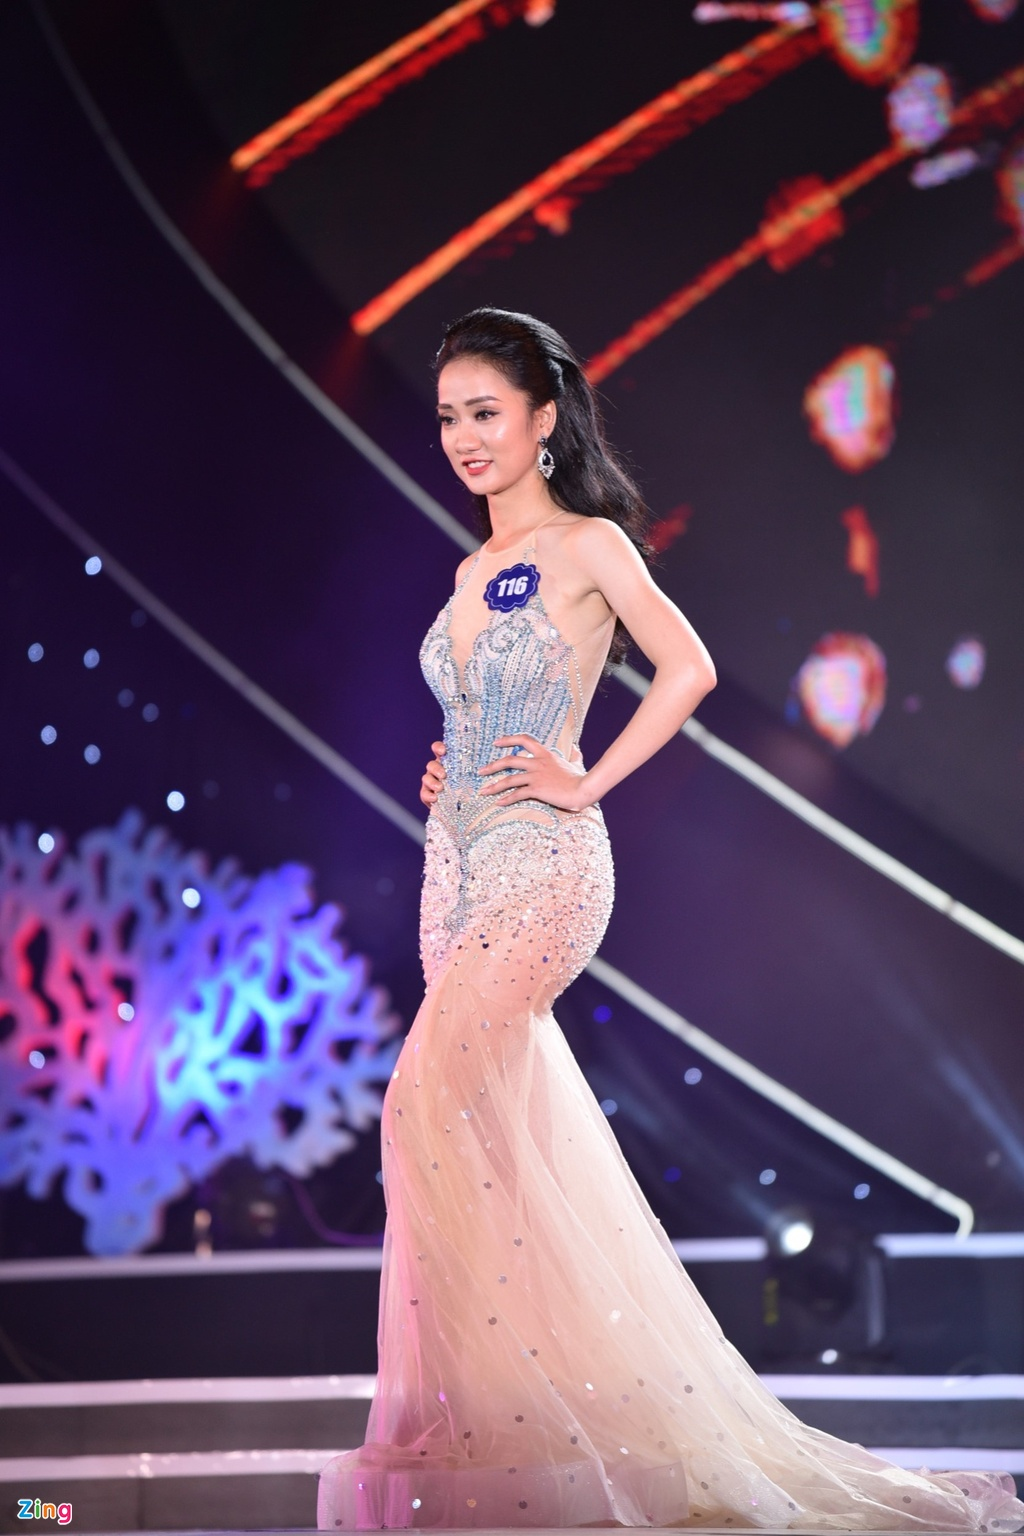 Chung ket Hoa hau Bien Viet Nam: Co gai Tien Giang 19 tuoi len ngoi hinh anh 18